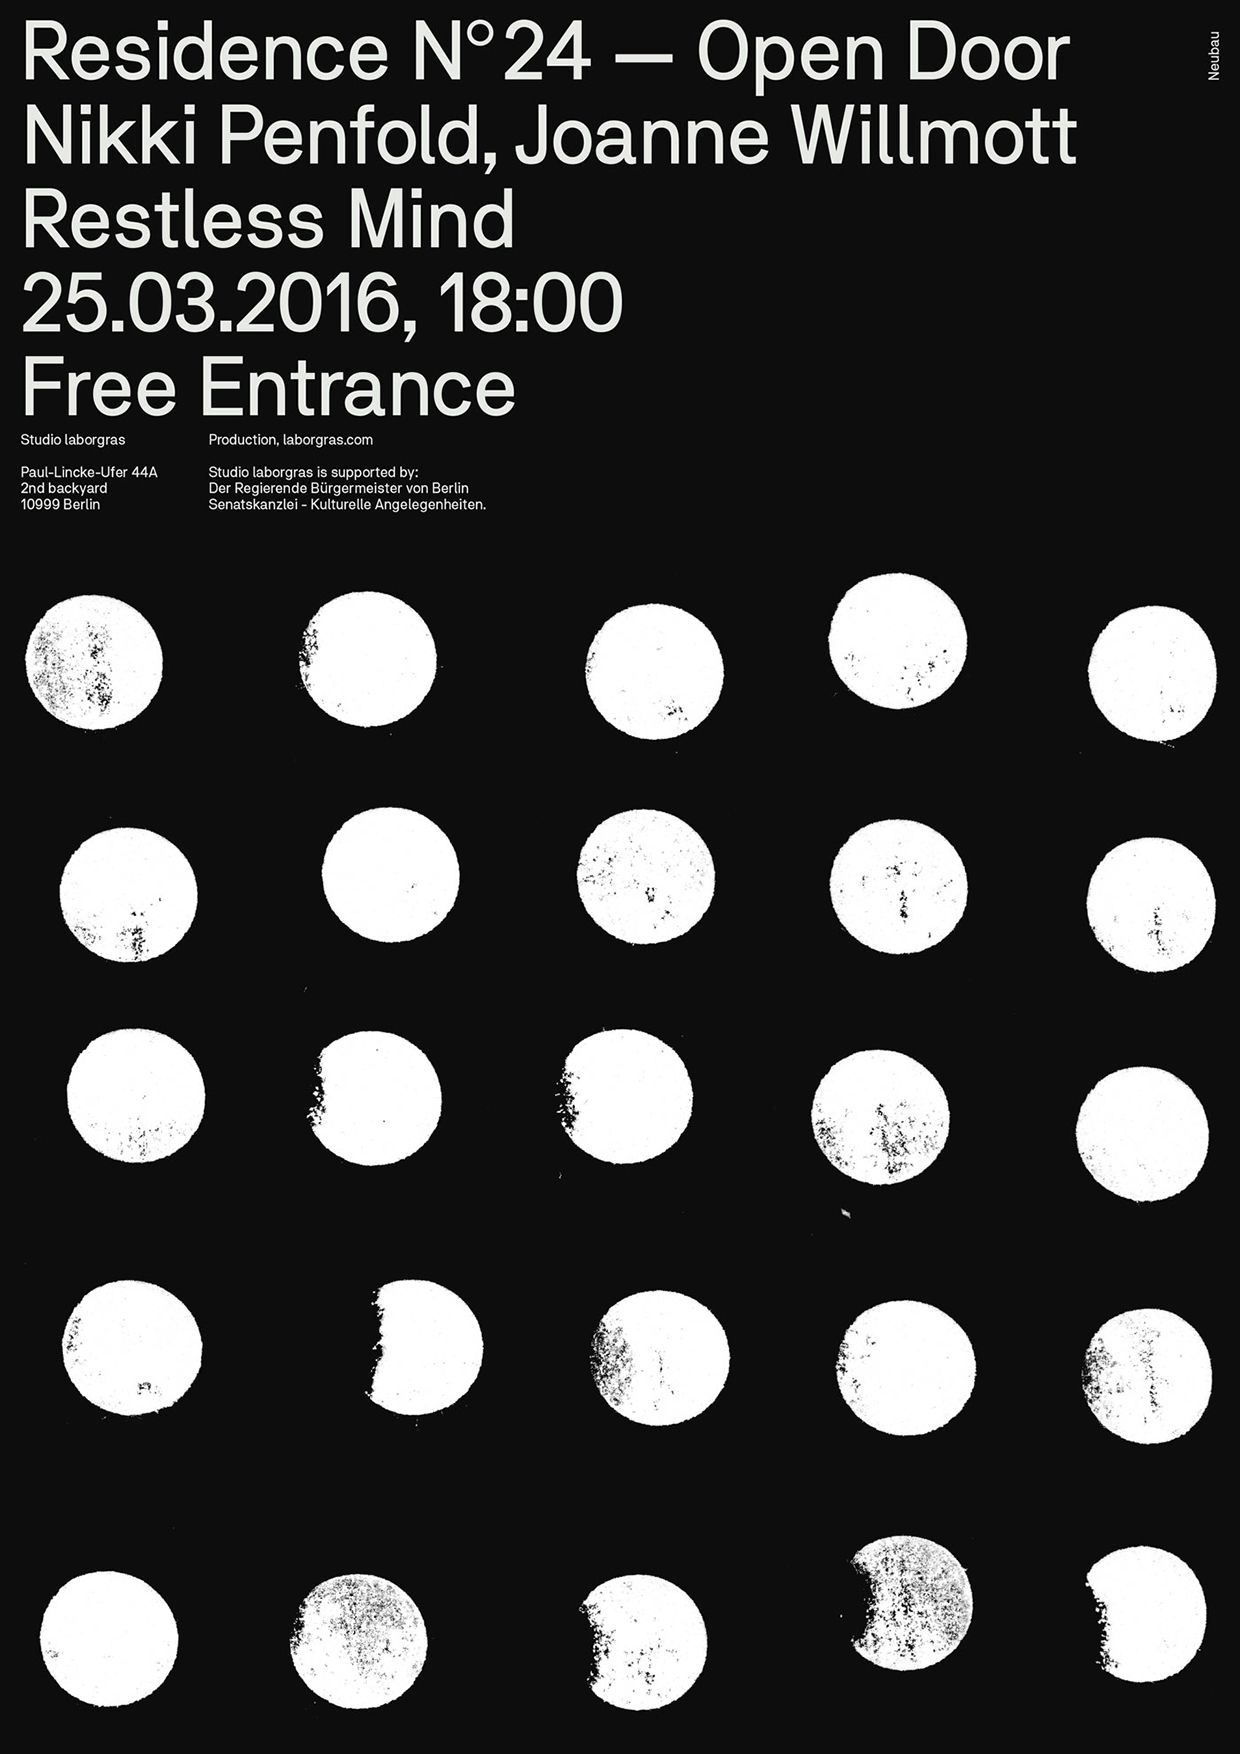 laborgras, Poster Series (2006—2016) on Behance